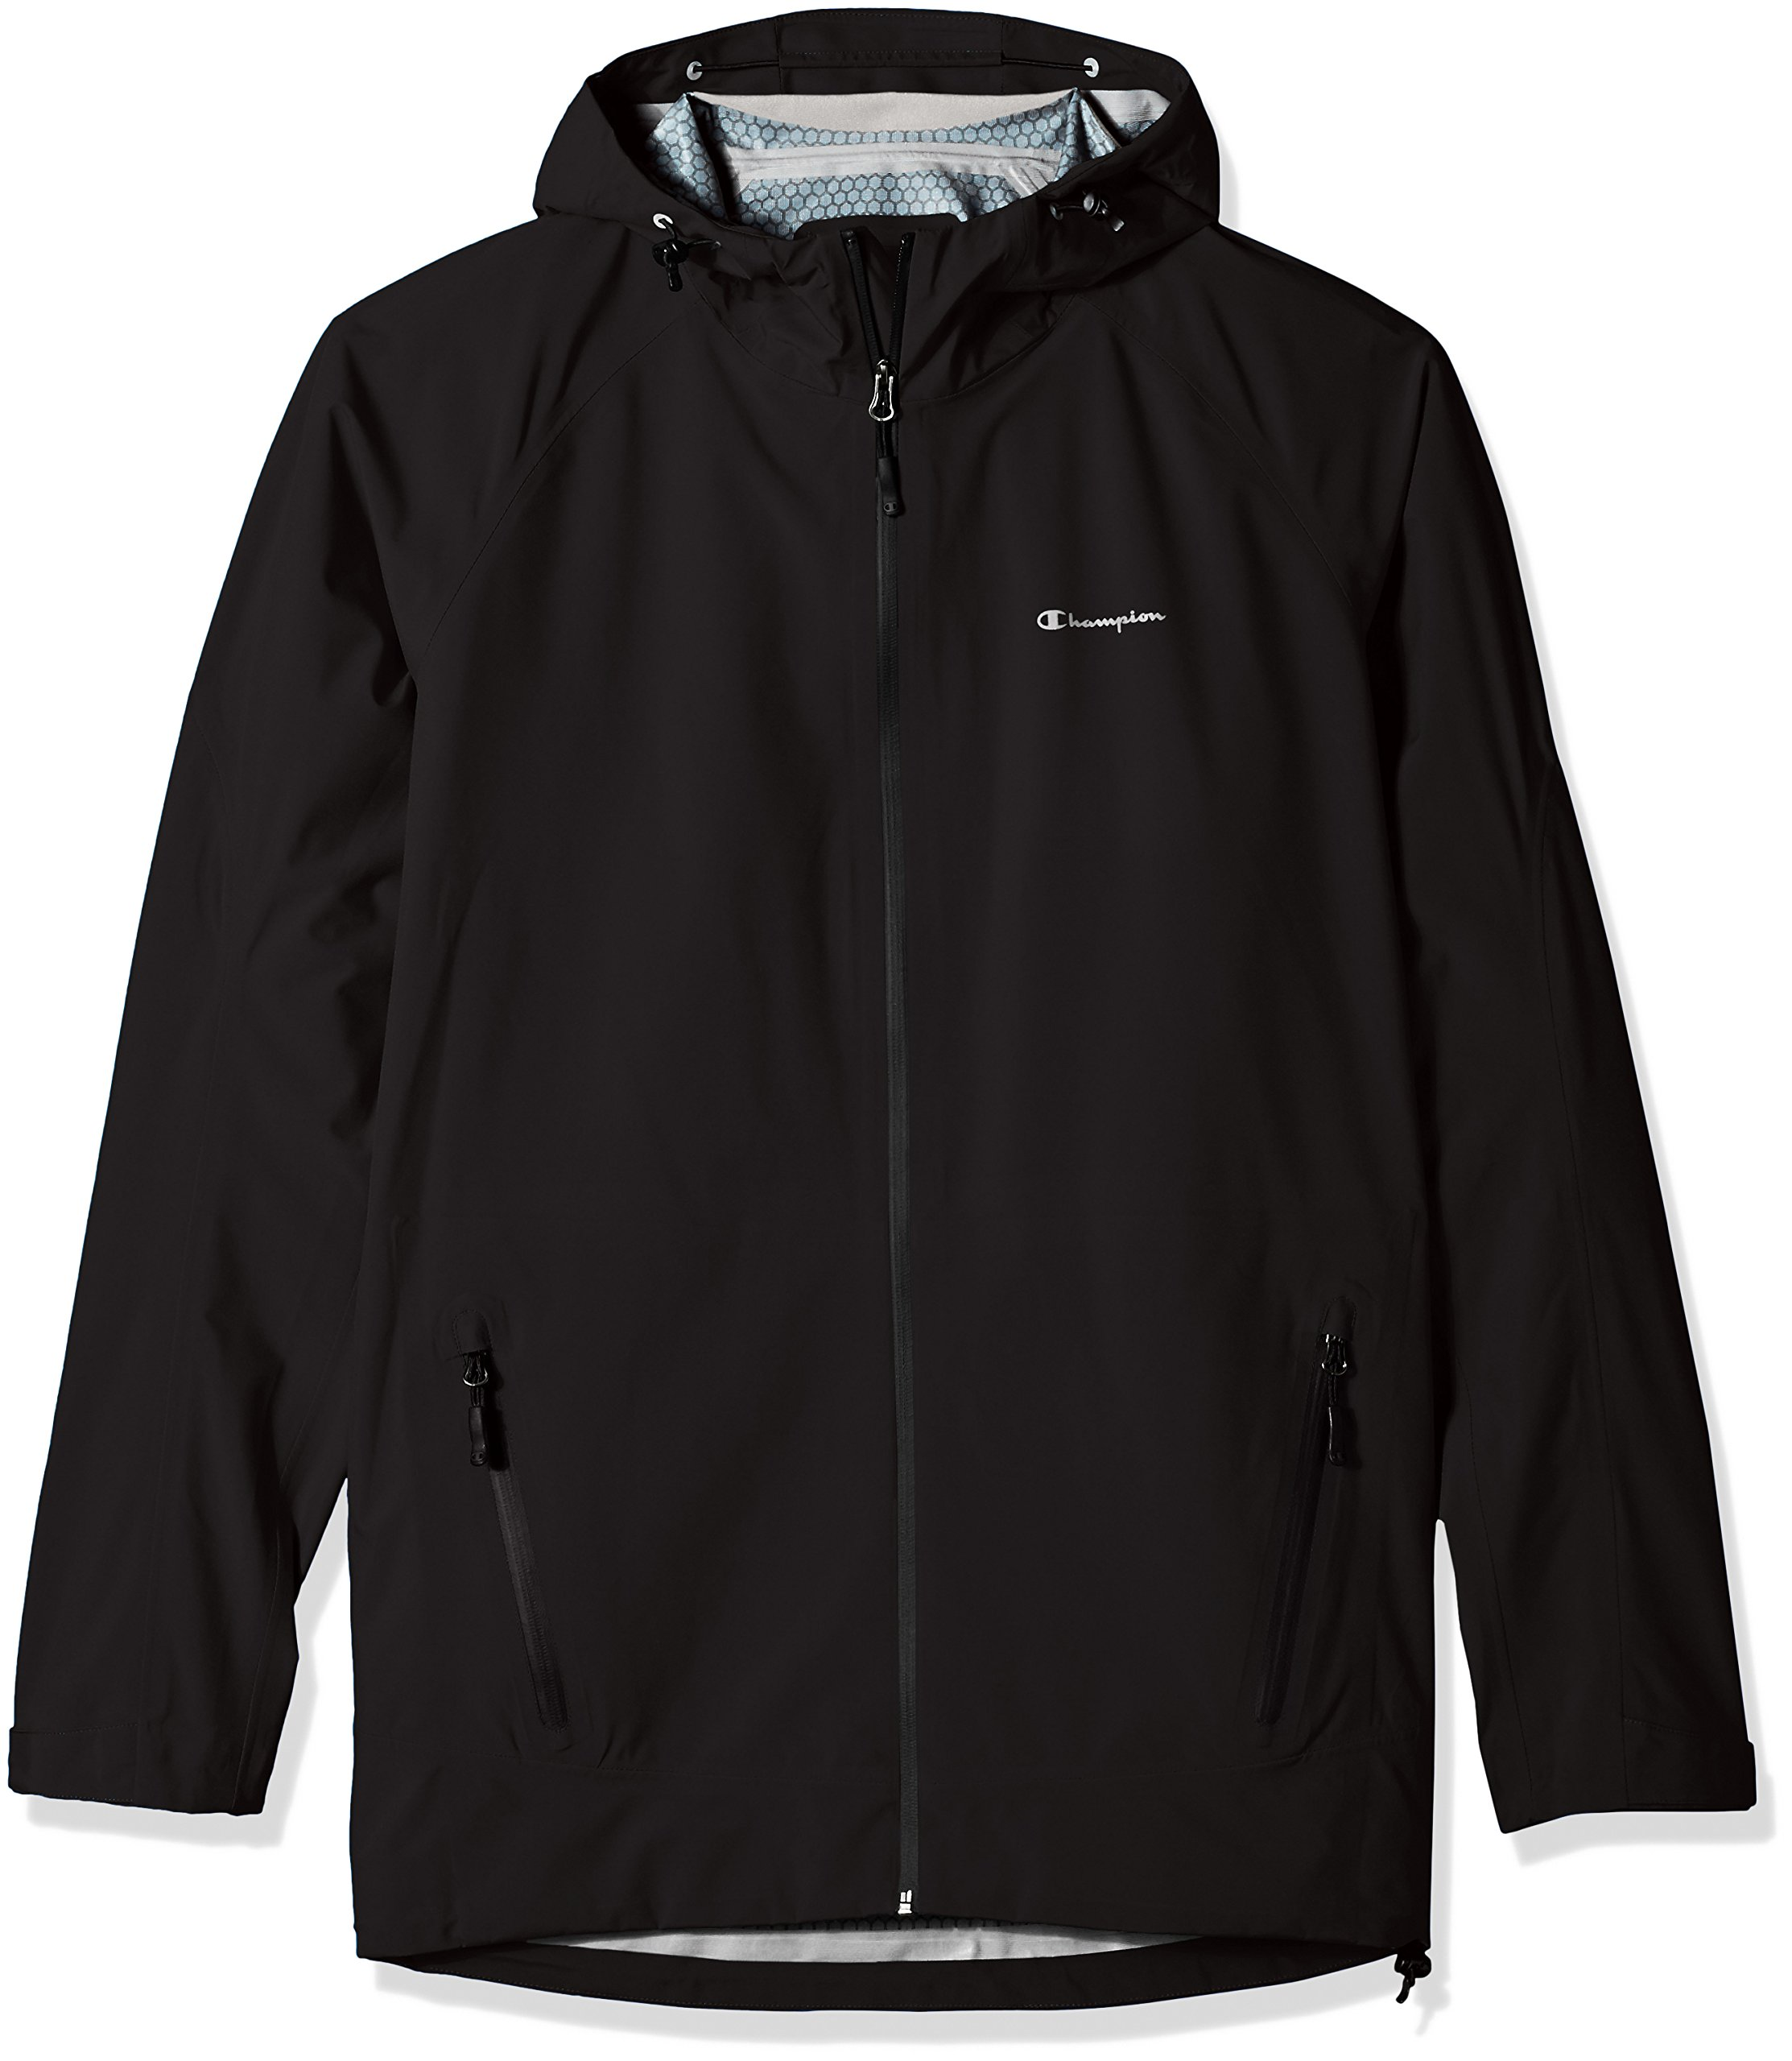 Champion Men's Tall Size Stretch Waterproof Rain Jacket, Black, XX-Large